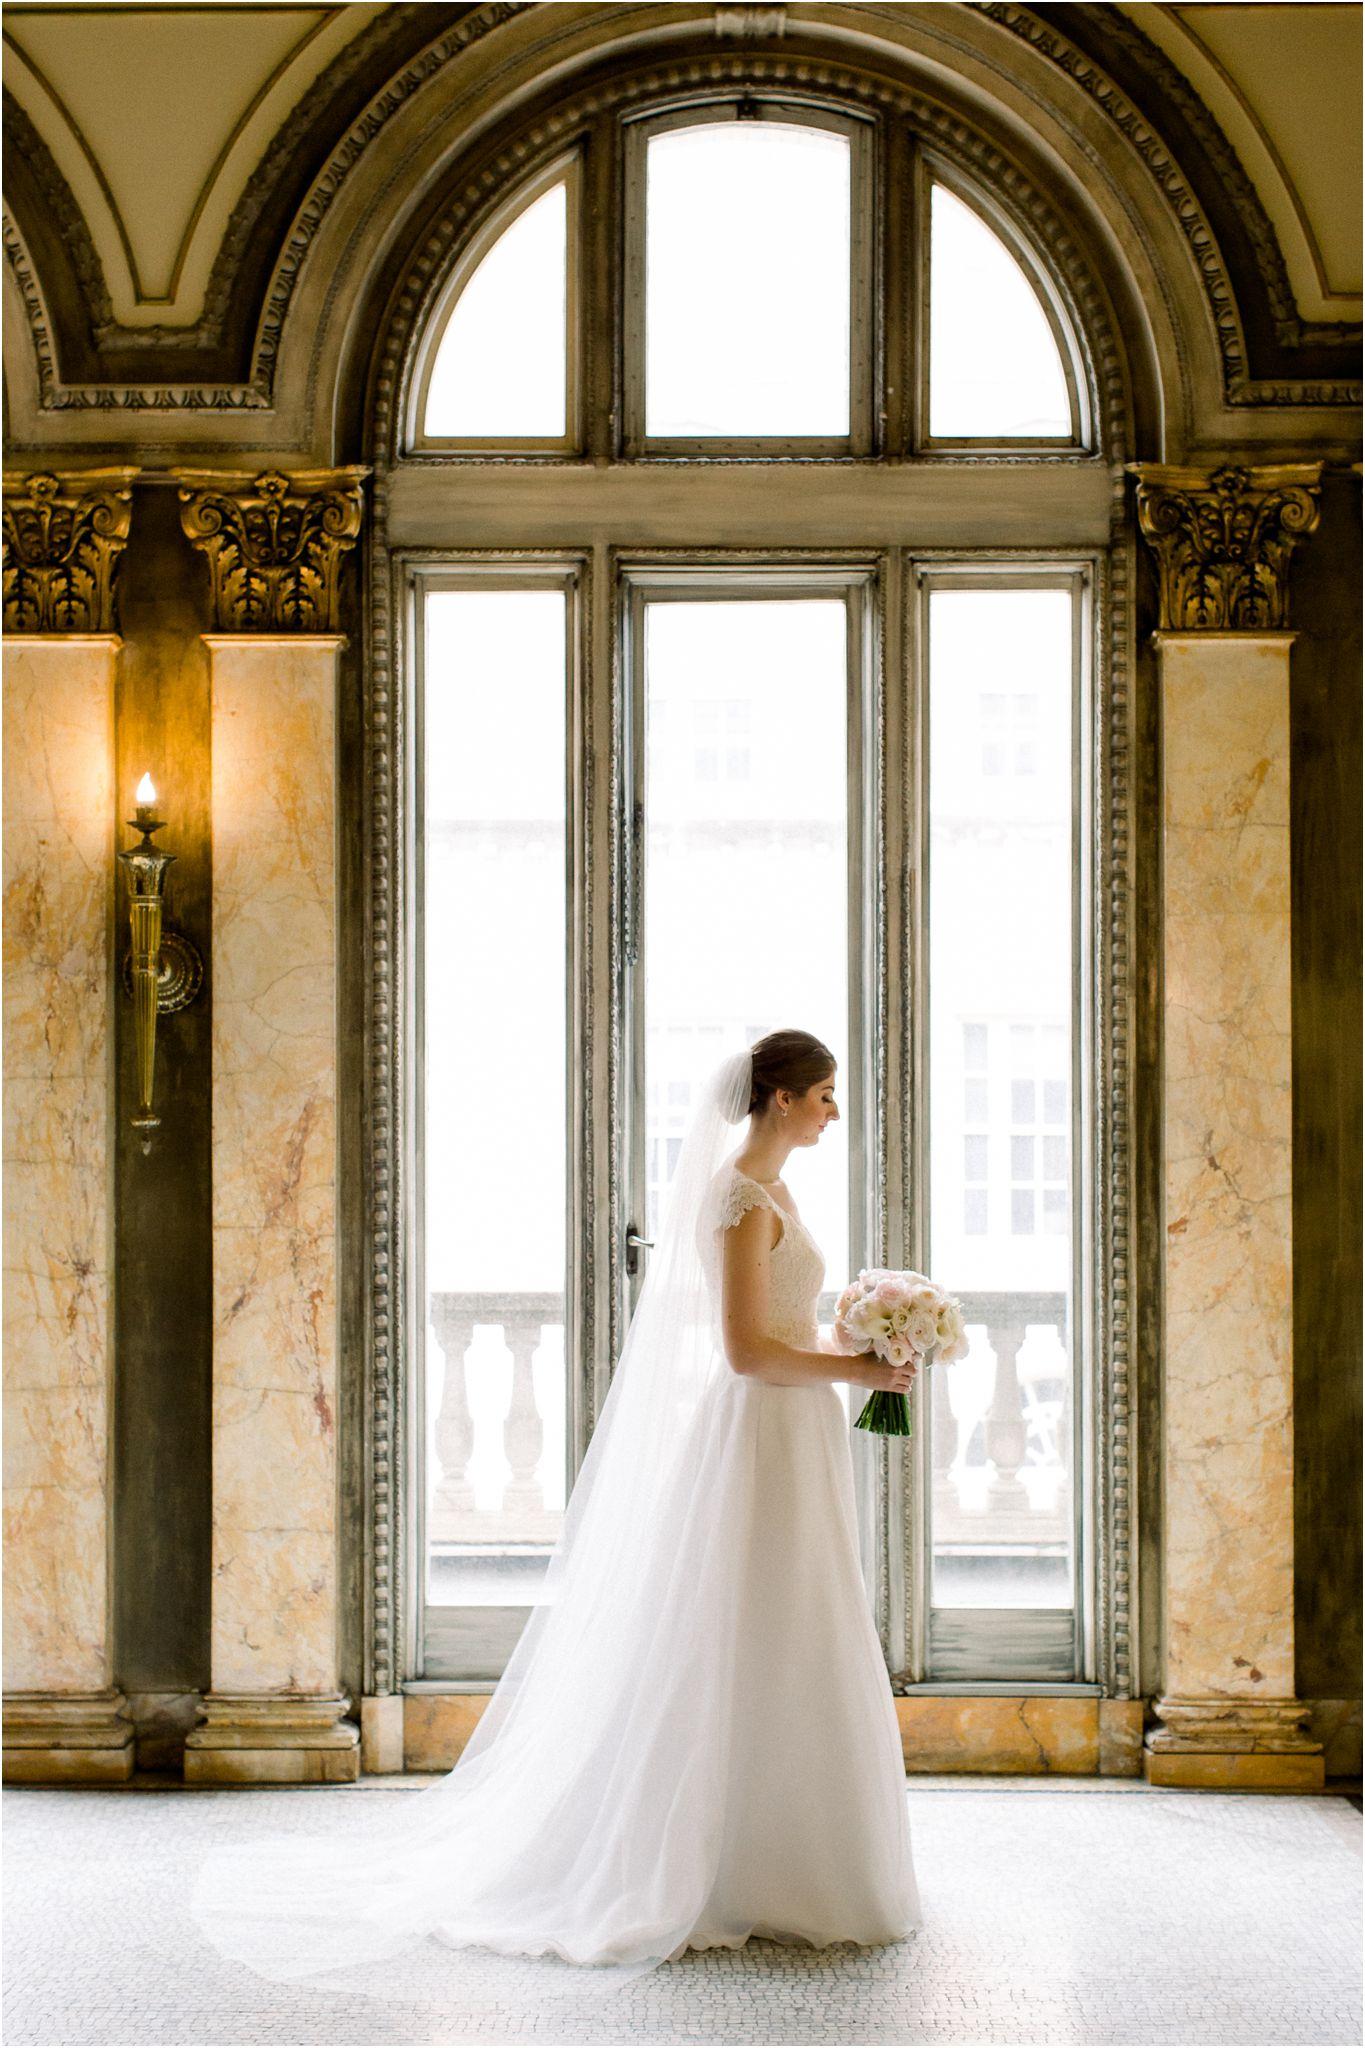 providence-public-library-wedding-images_00008.JPG